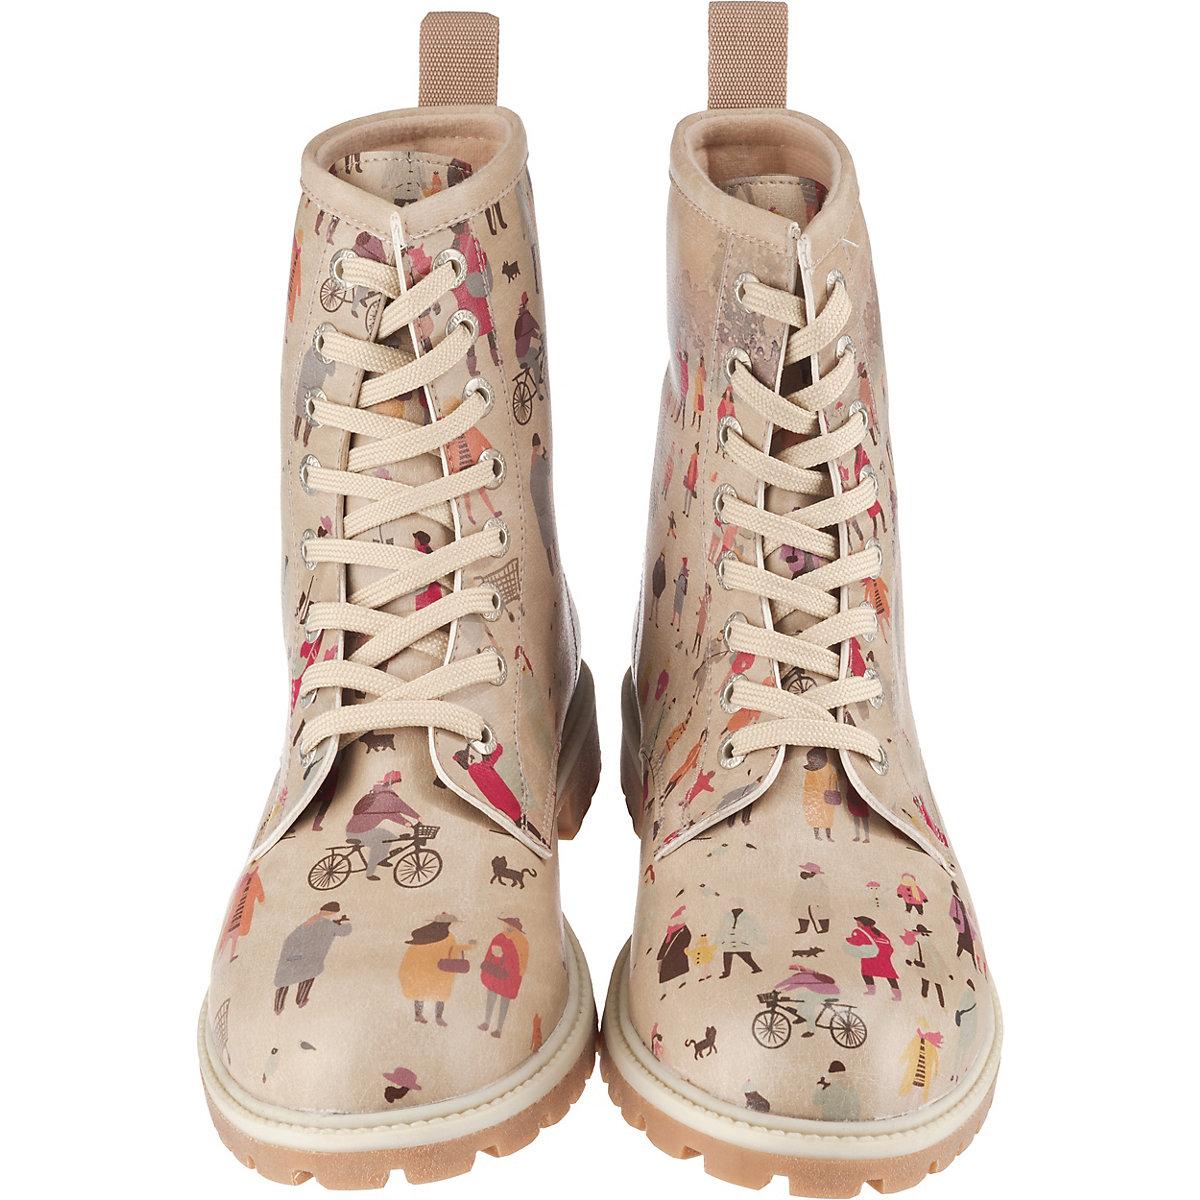 Dogo Shoes, Snow Square Schnürstiefel, Mehrfarbig